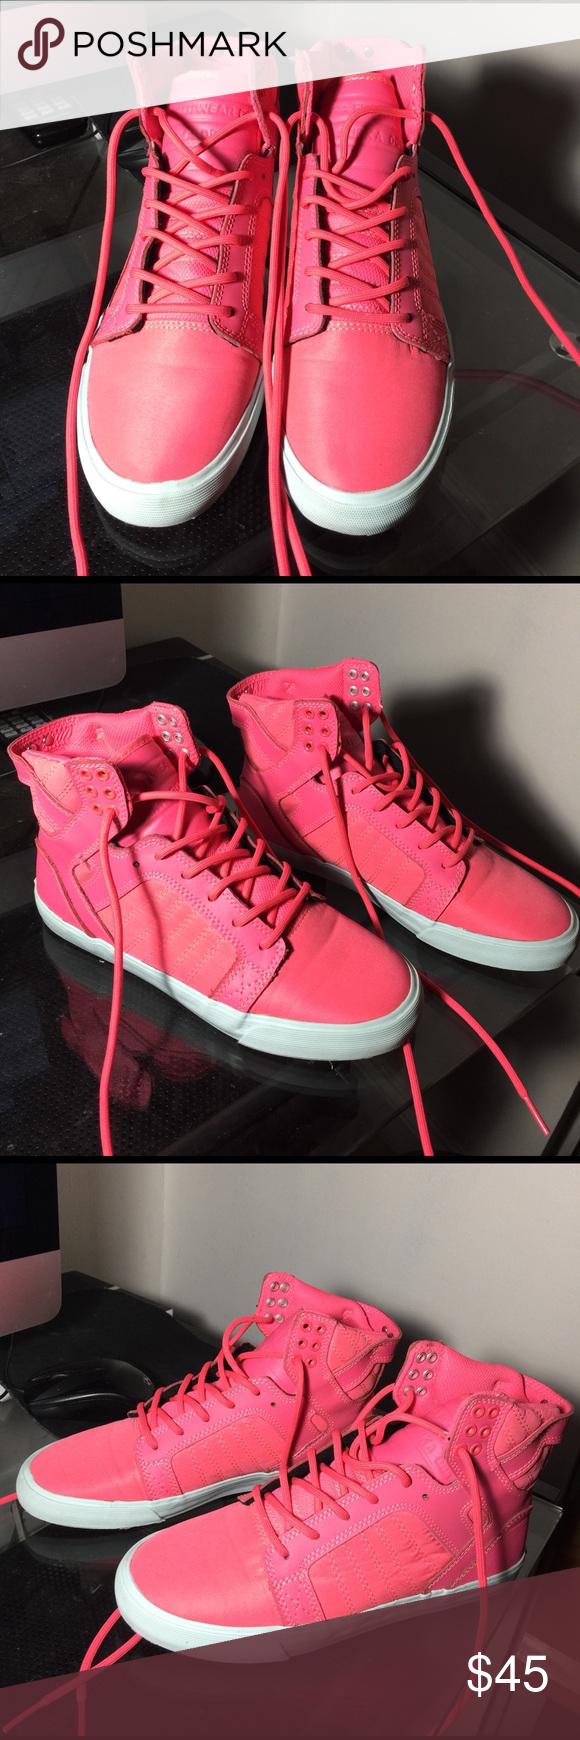 MUSKA 001 Size 8 Pre-owned SUPRA FOOTWEAR CO MUSKA 001 Size 8.  Women s SW18015 LU 13D Supra Shoes Athletic Shoes aa1b5512b